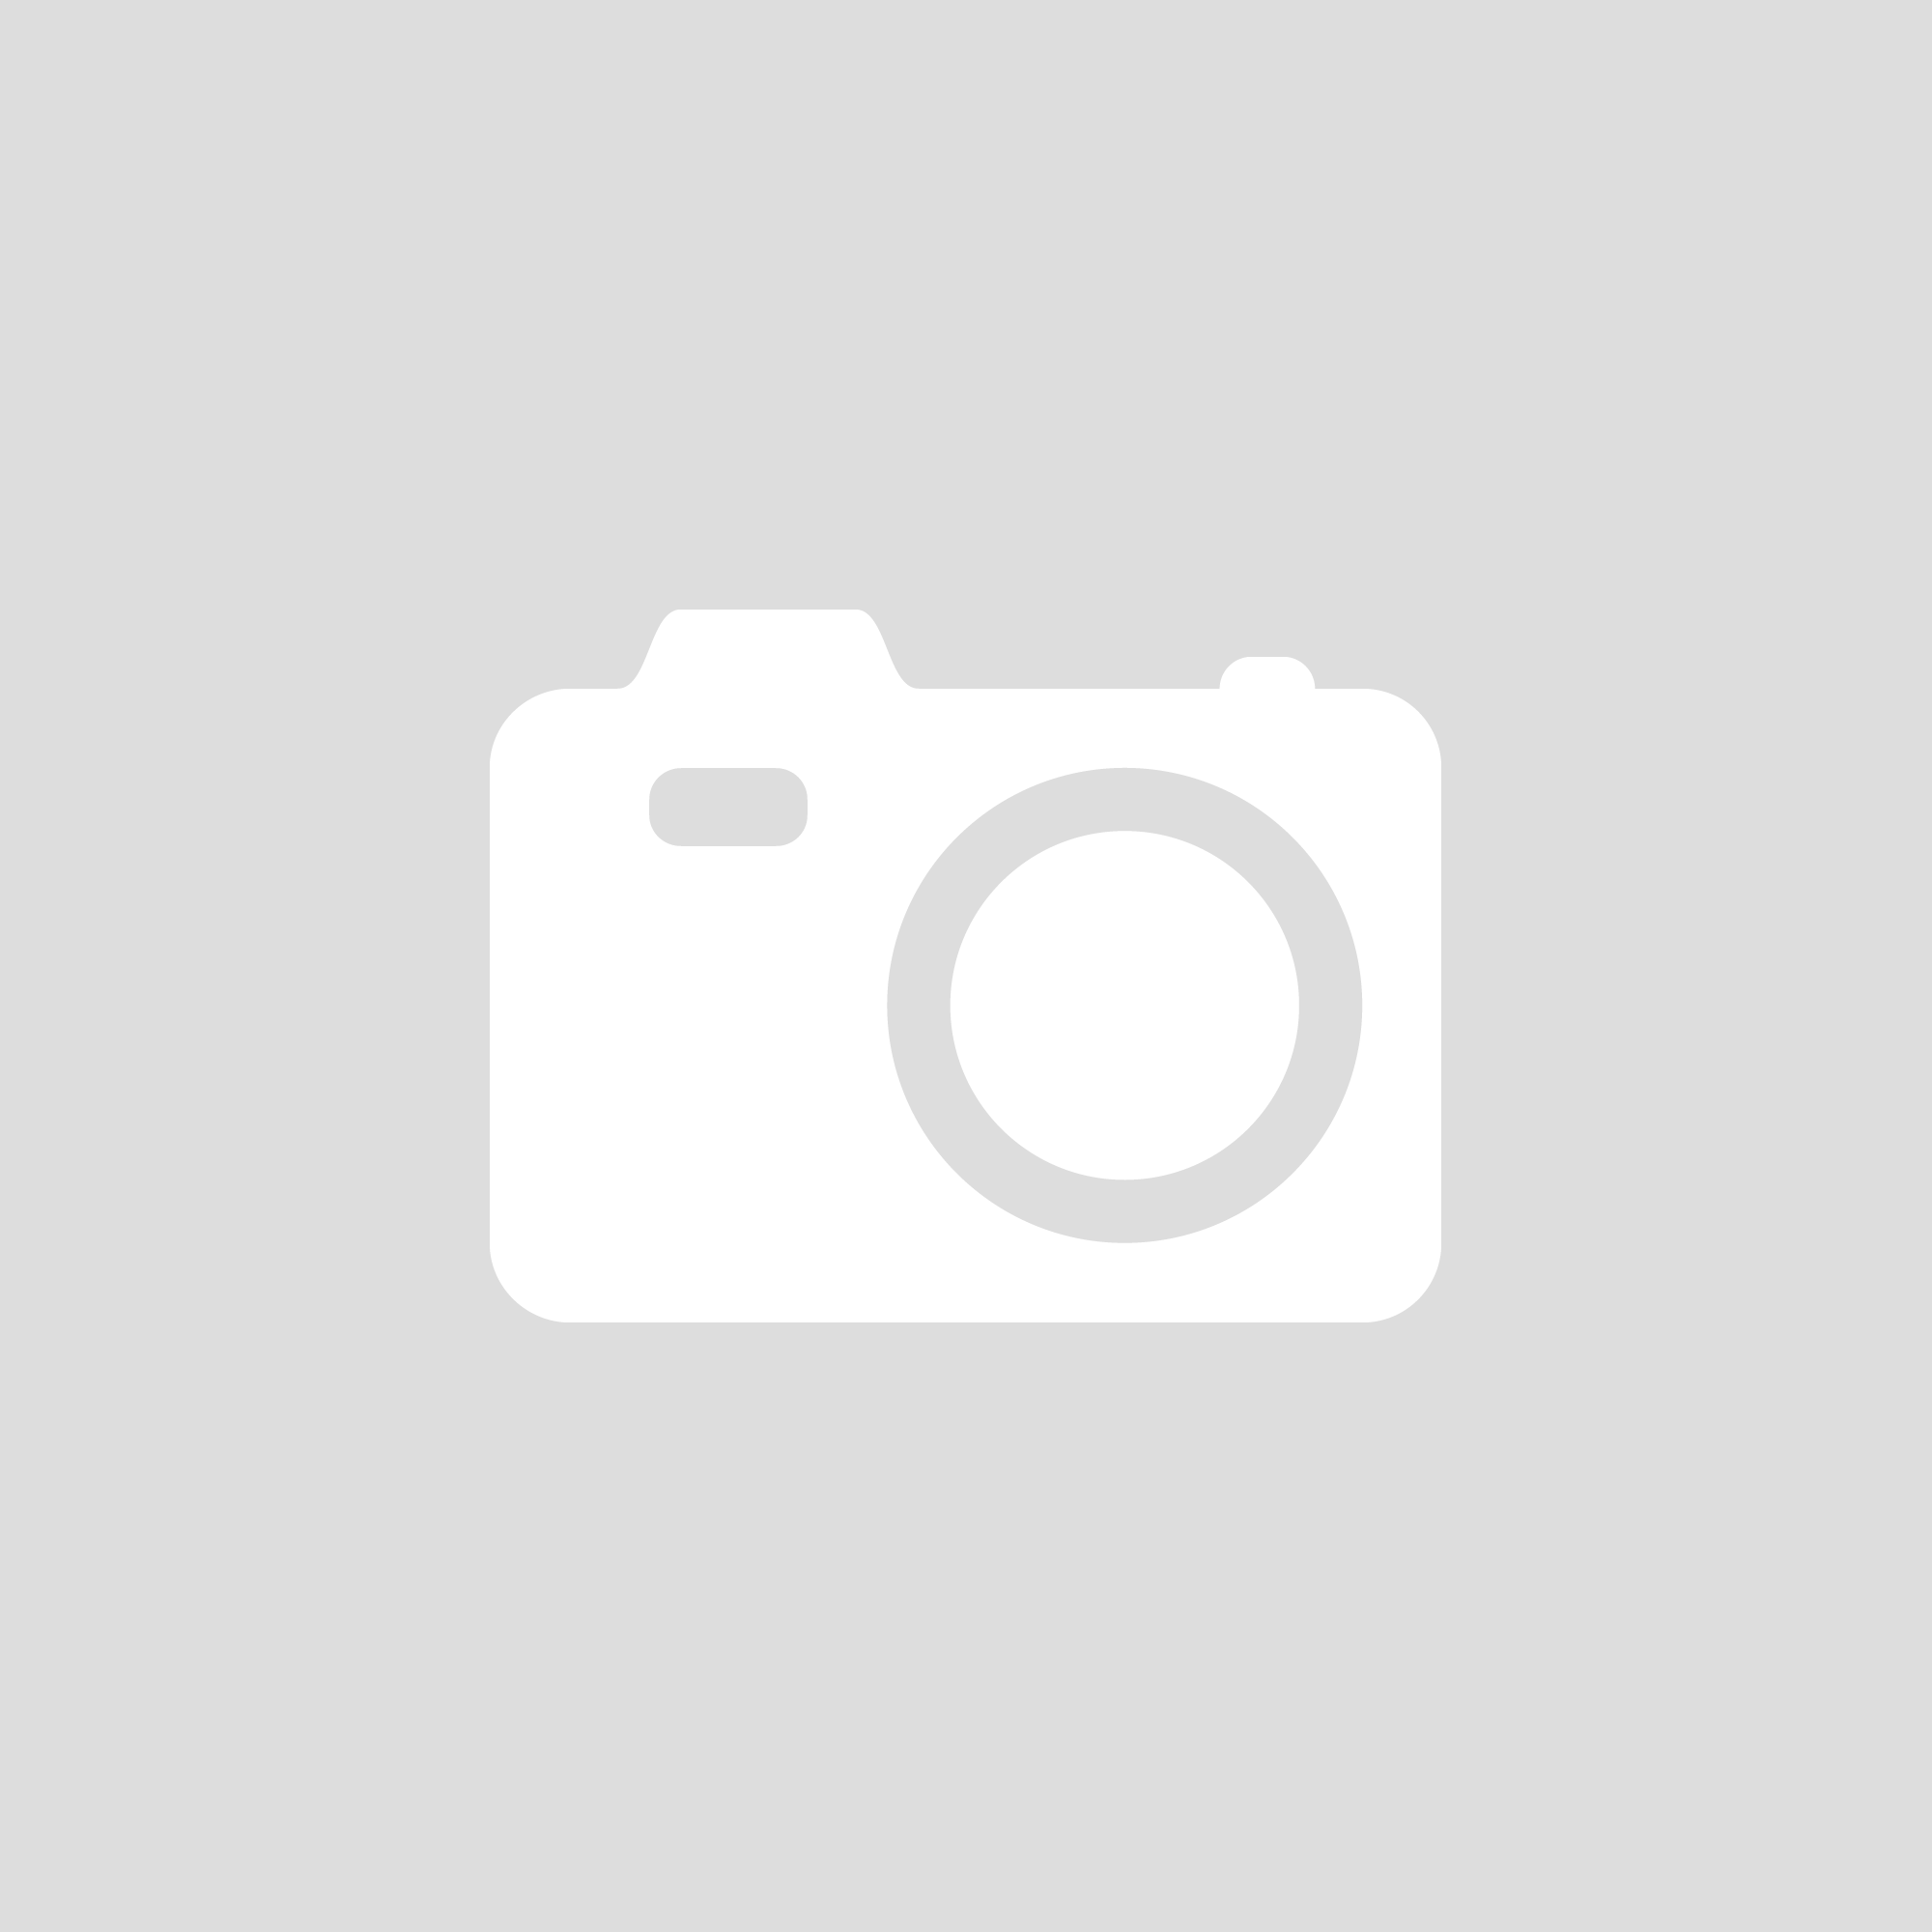 Tiffany Pearl Caramel Wallpaper by Belgravia GB 39066